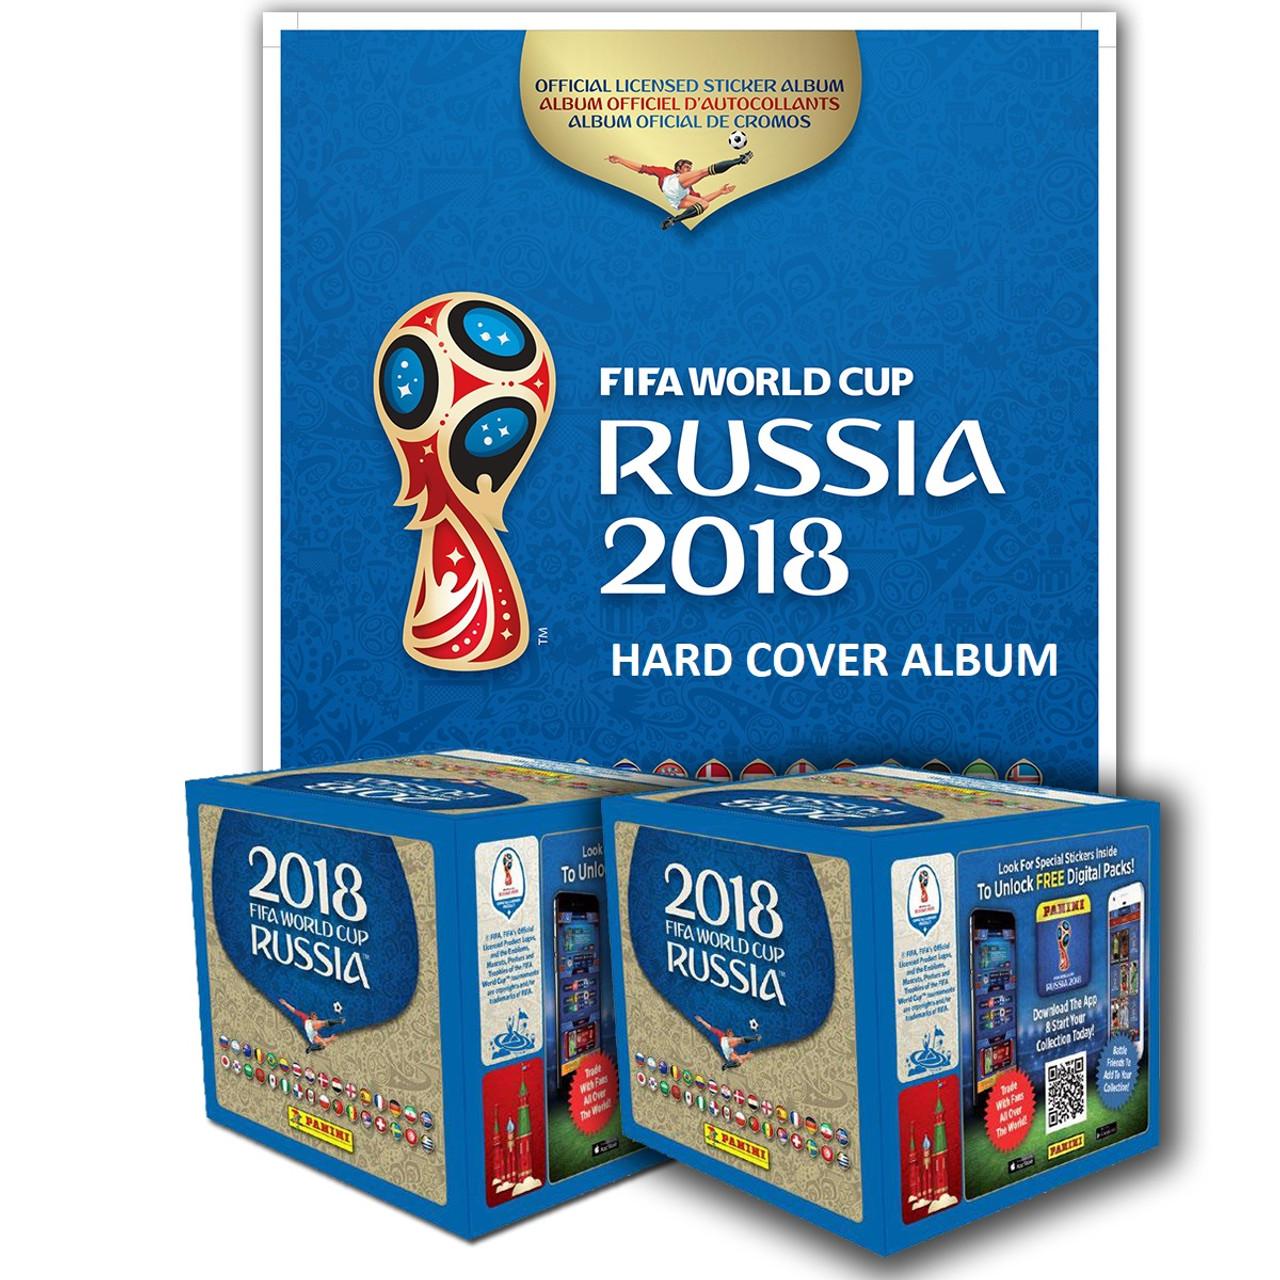 Fifa world cup panini 2018 fifa 18 wir haben festgestellt dass